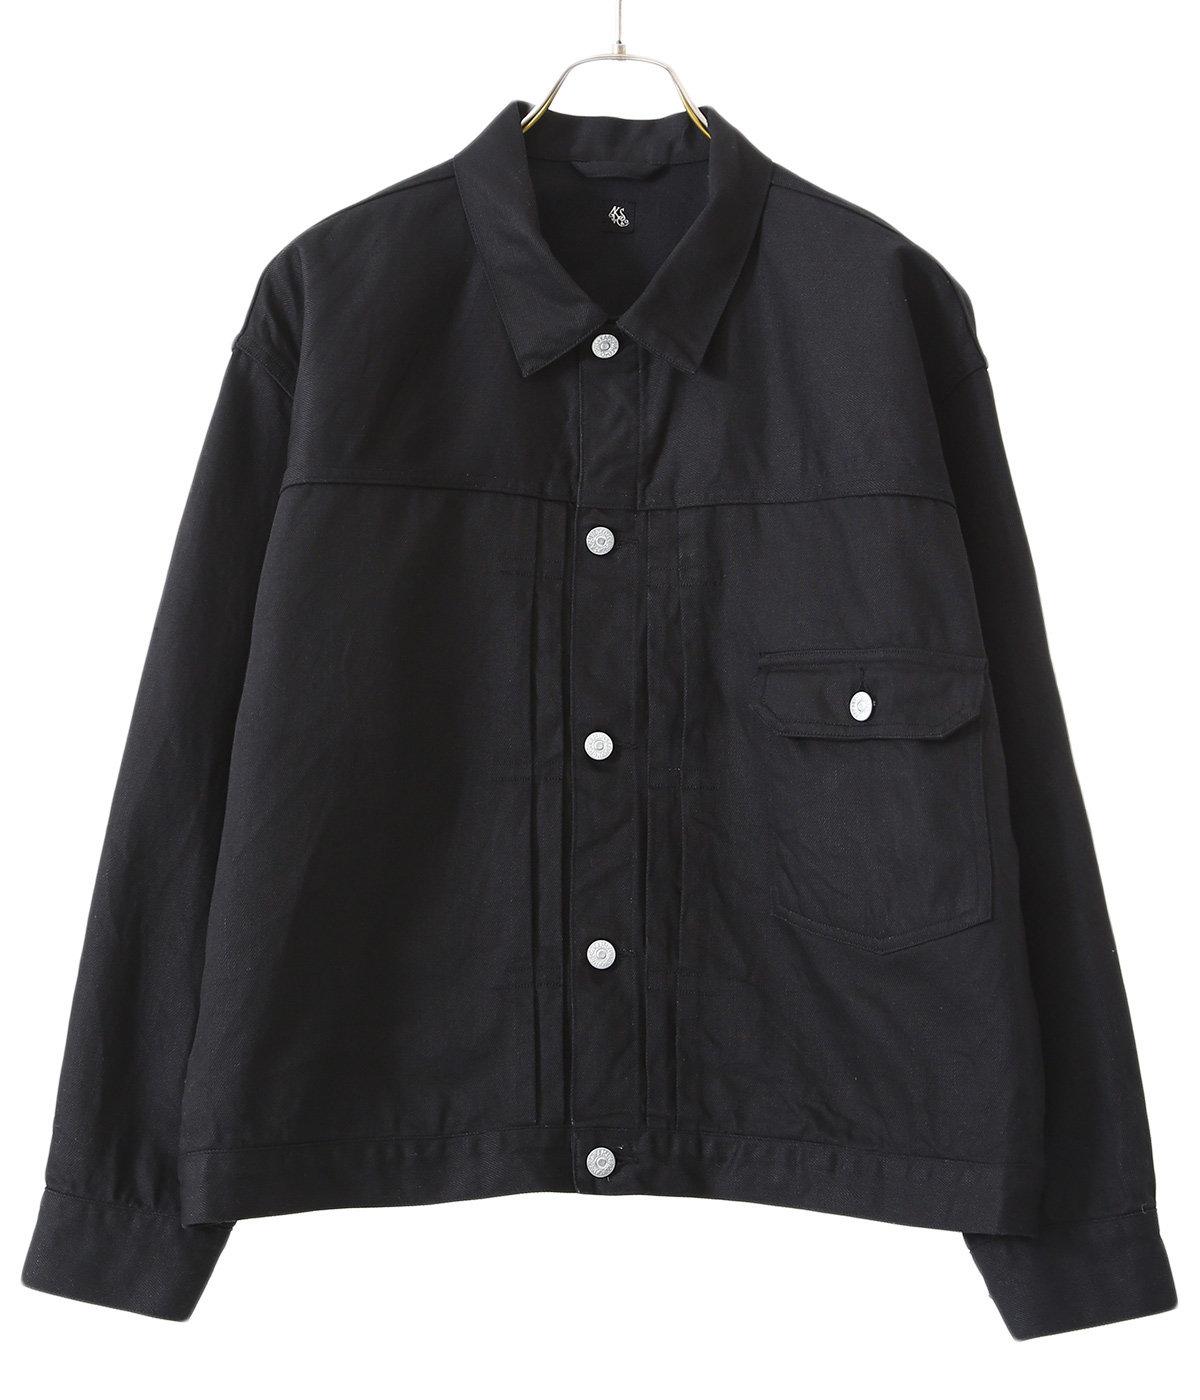 Black Tracker Jacket